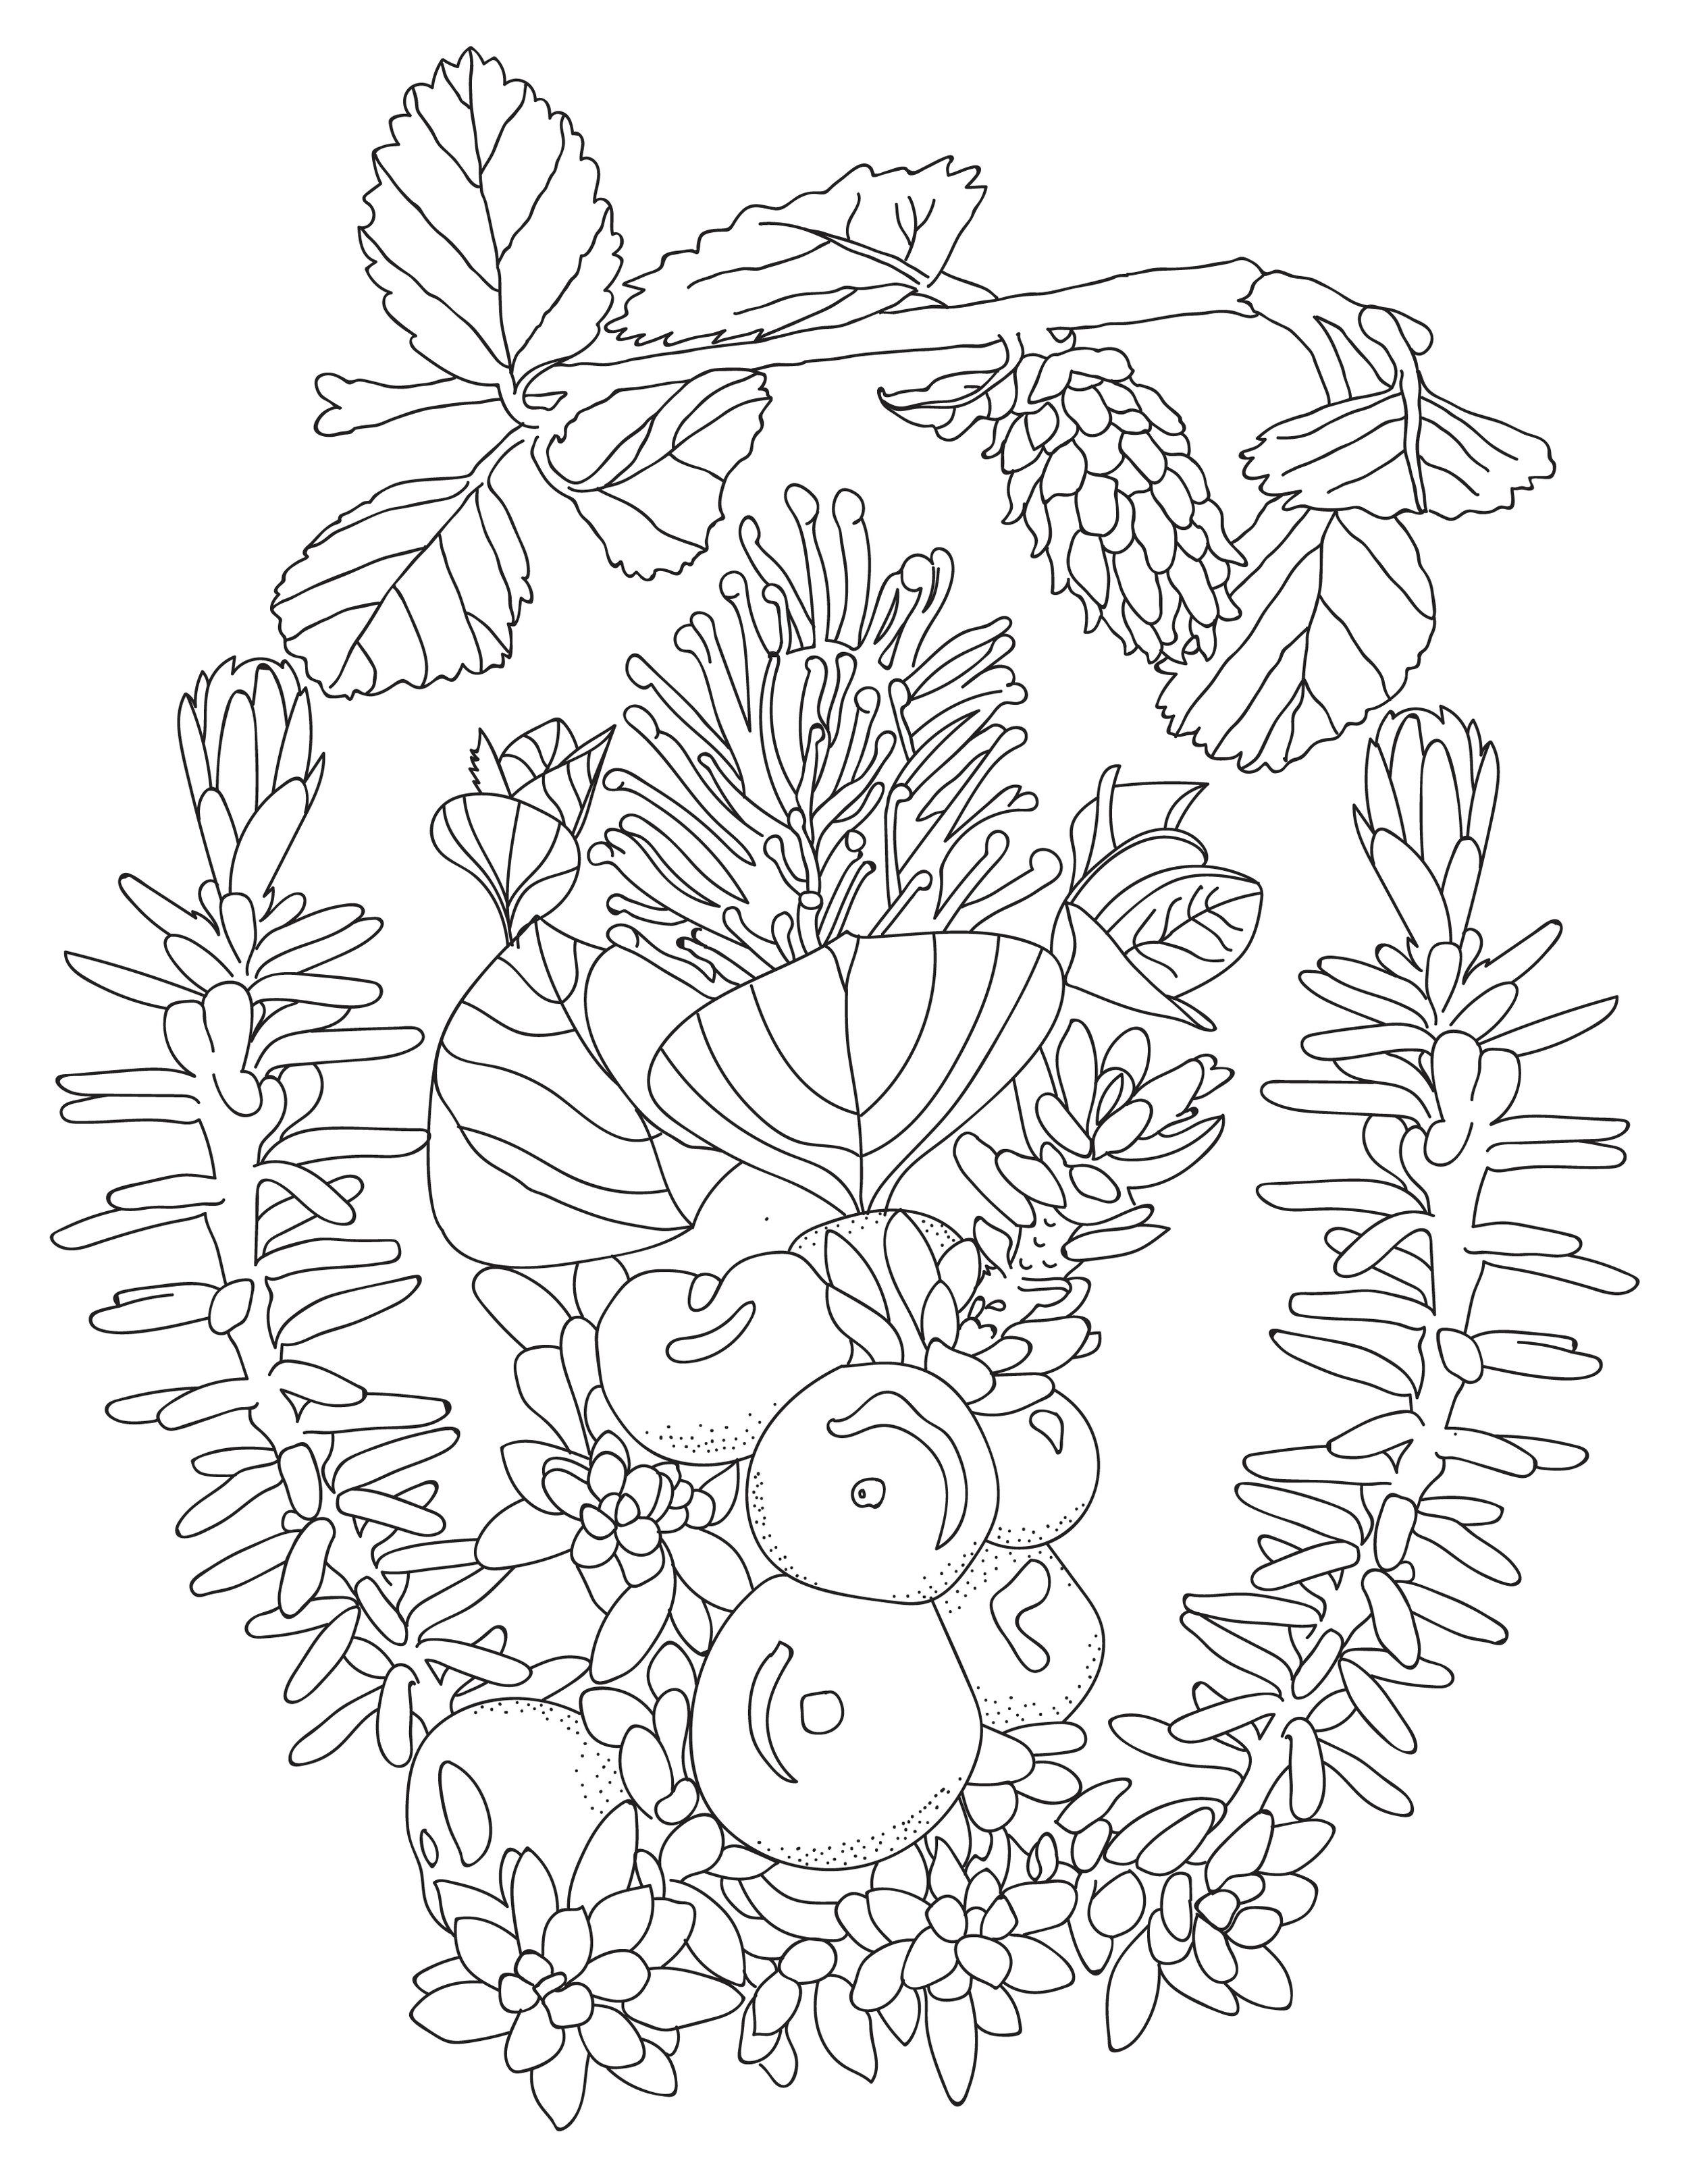 Arctic Plants Colouring sheets-02.jpg